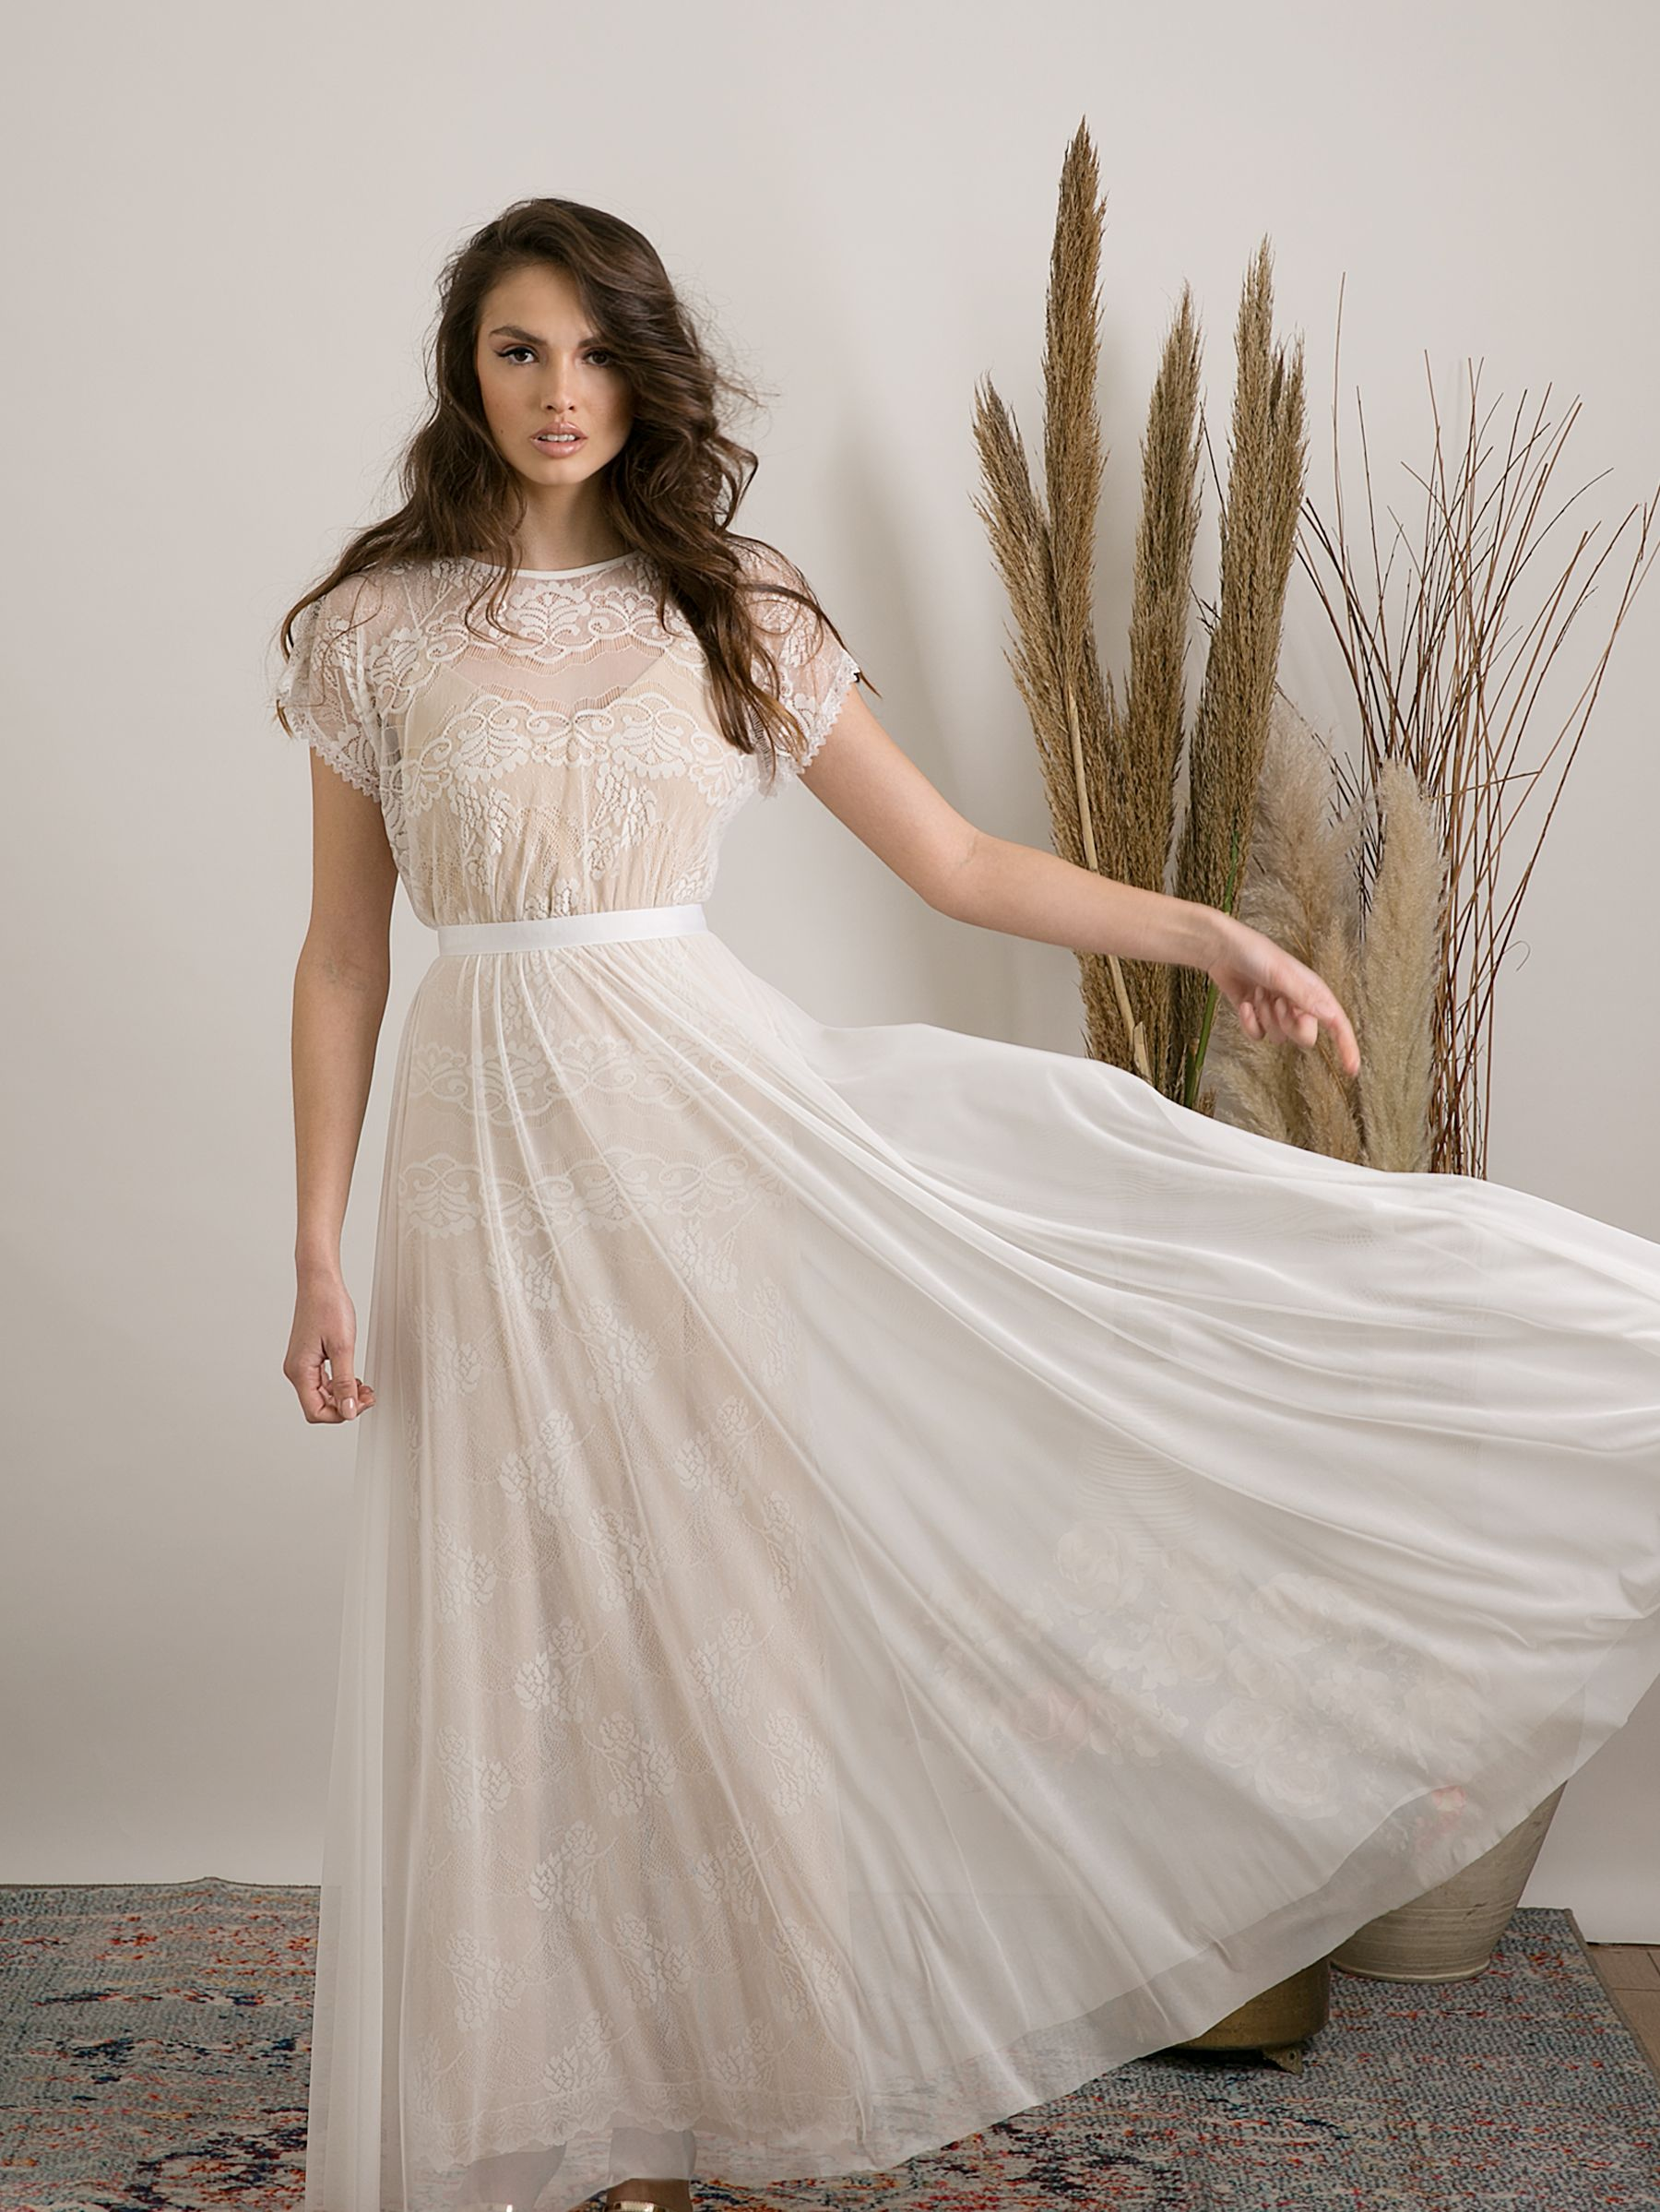 Modern casual lace bohemian wedding dress. Unique & Etsy